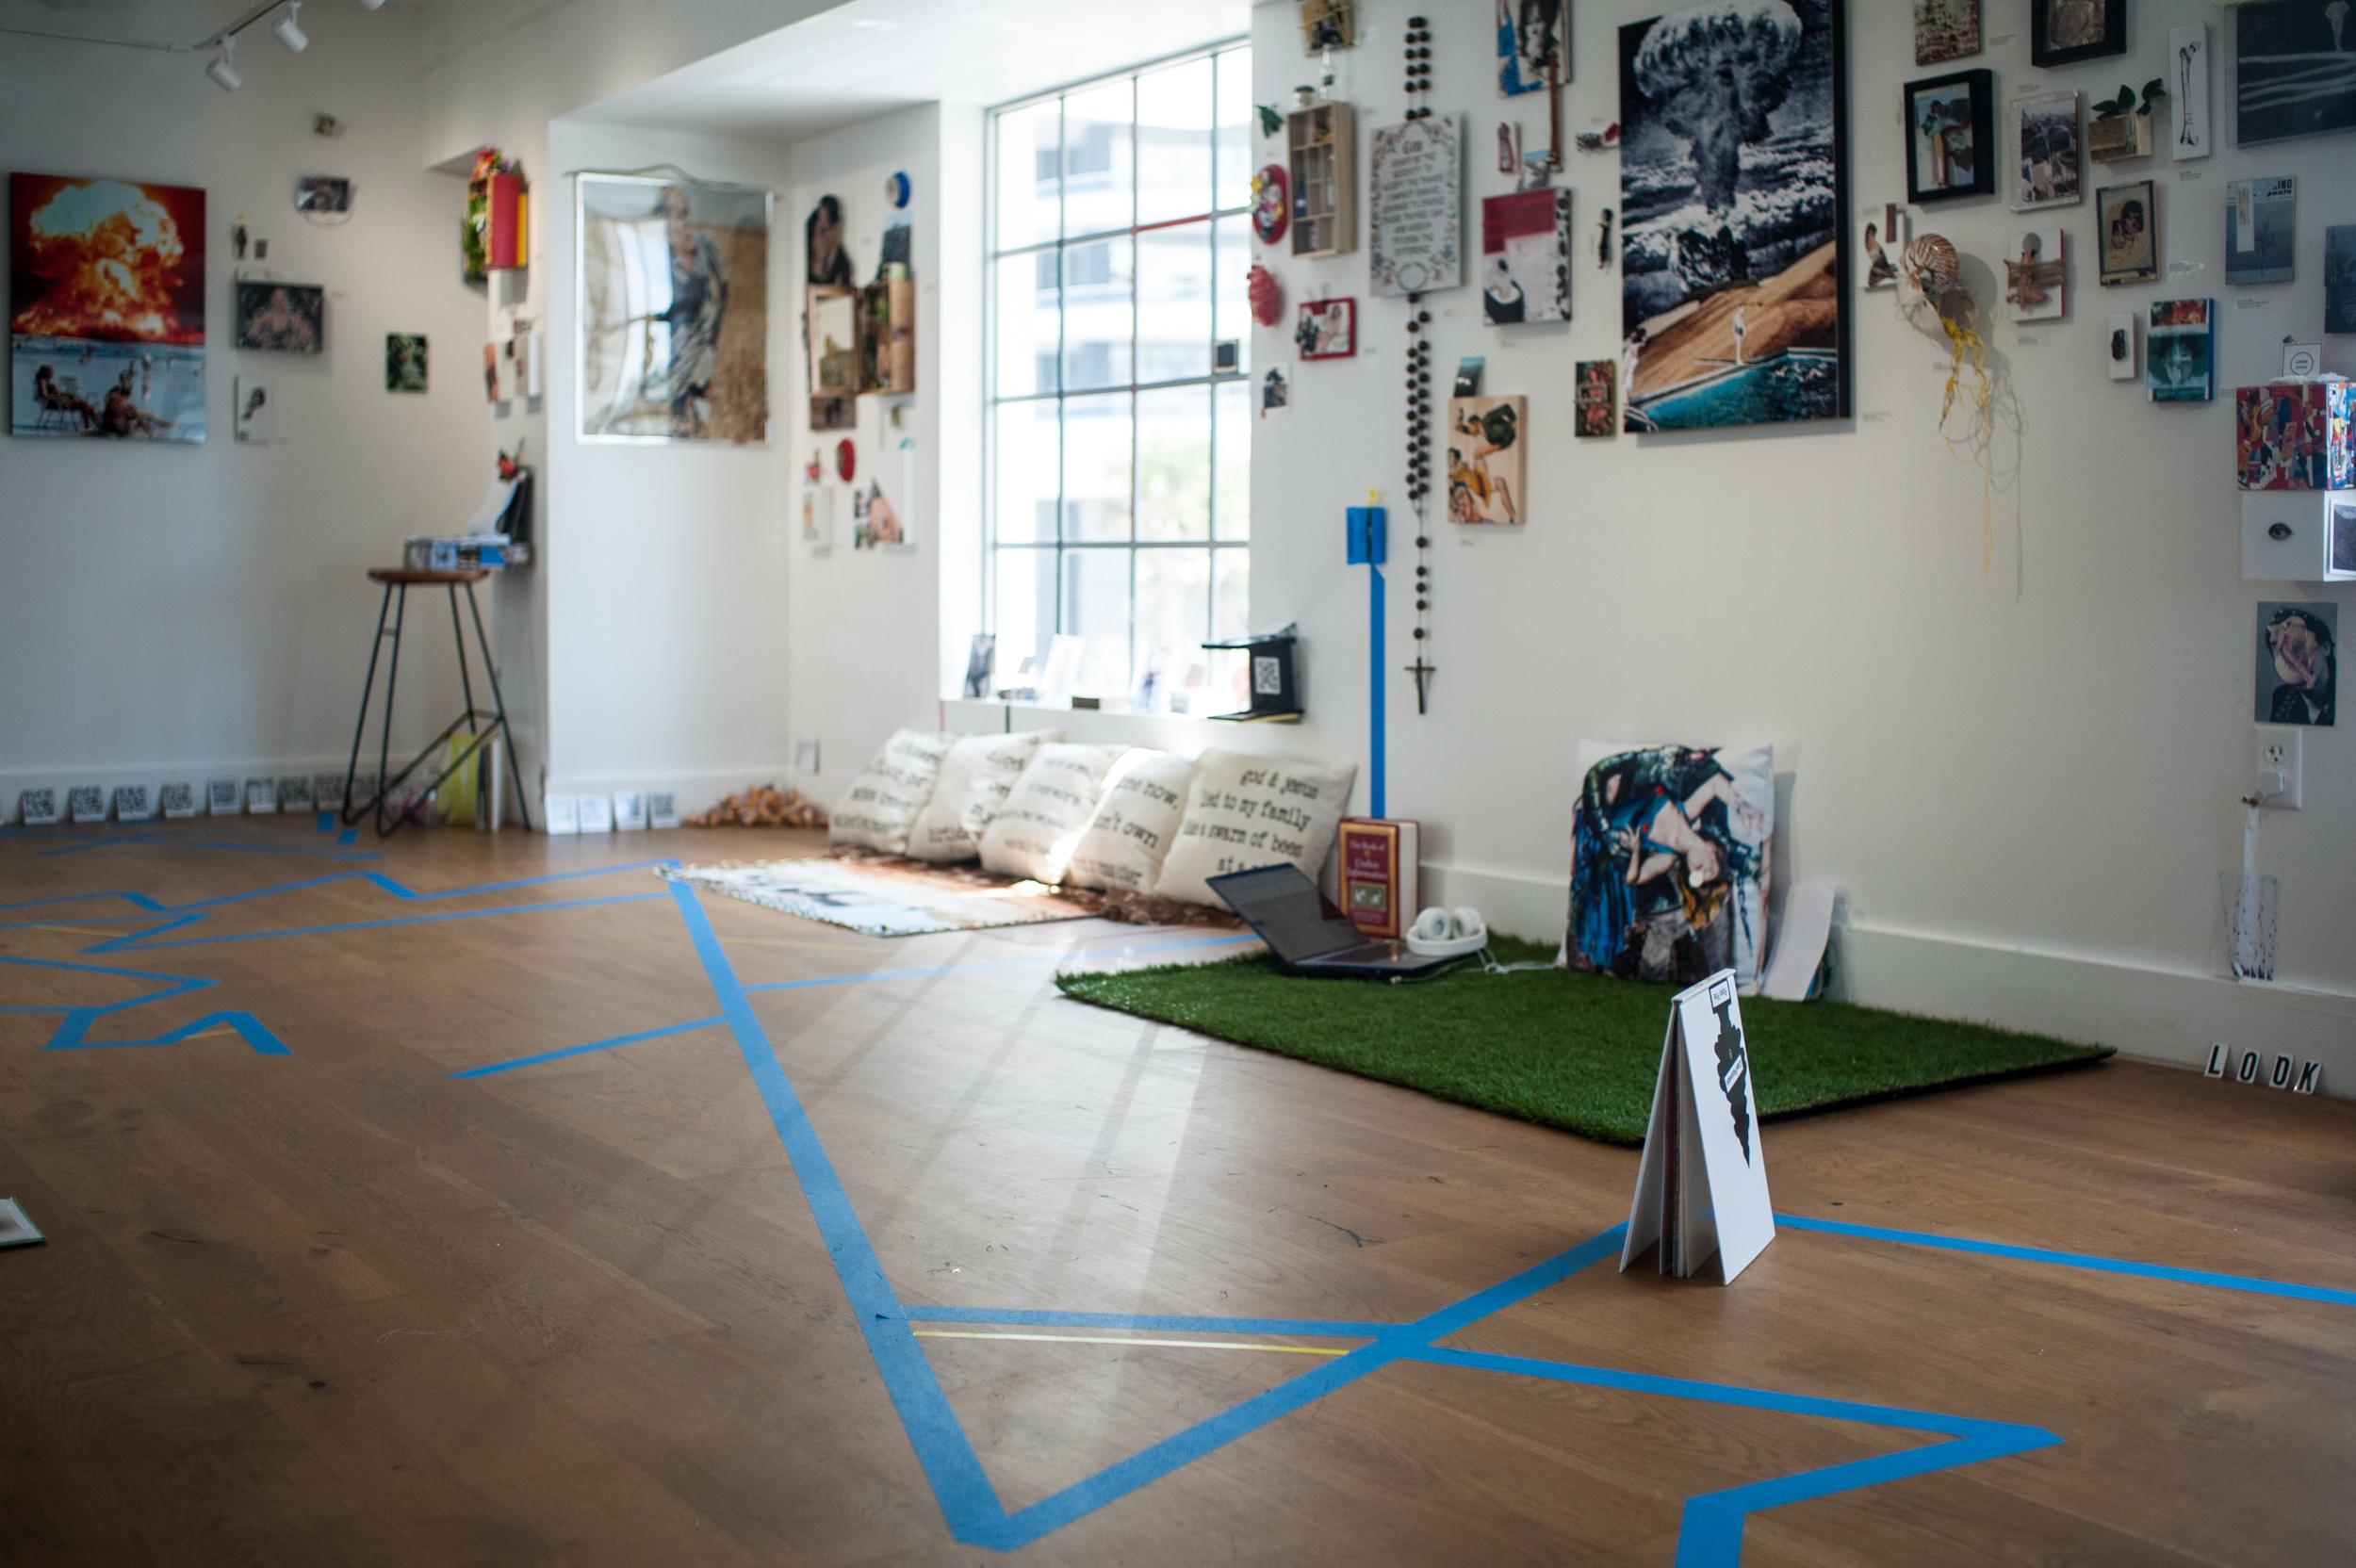 Faena-Exhibition-Images-60.jpg